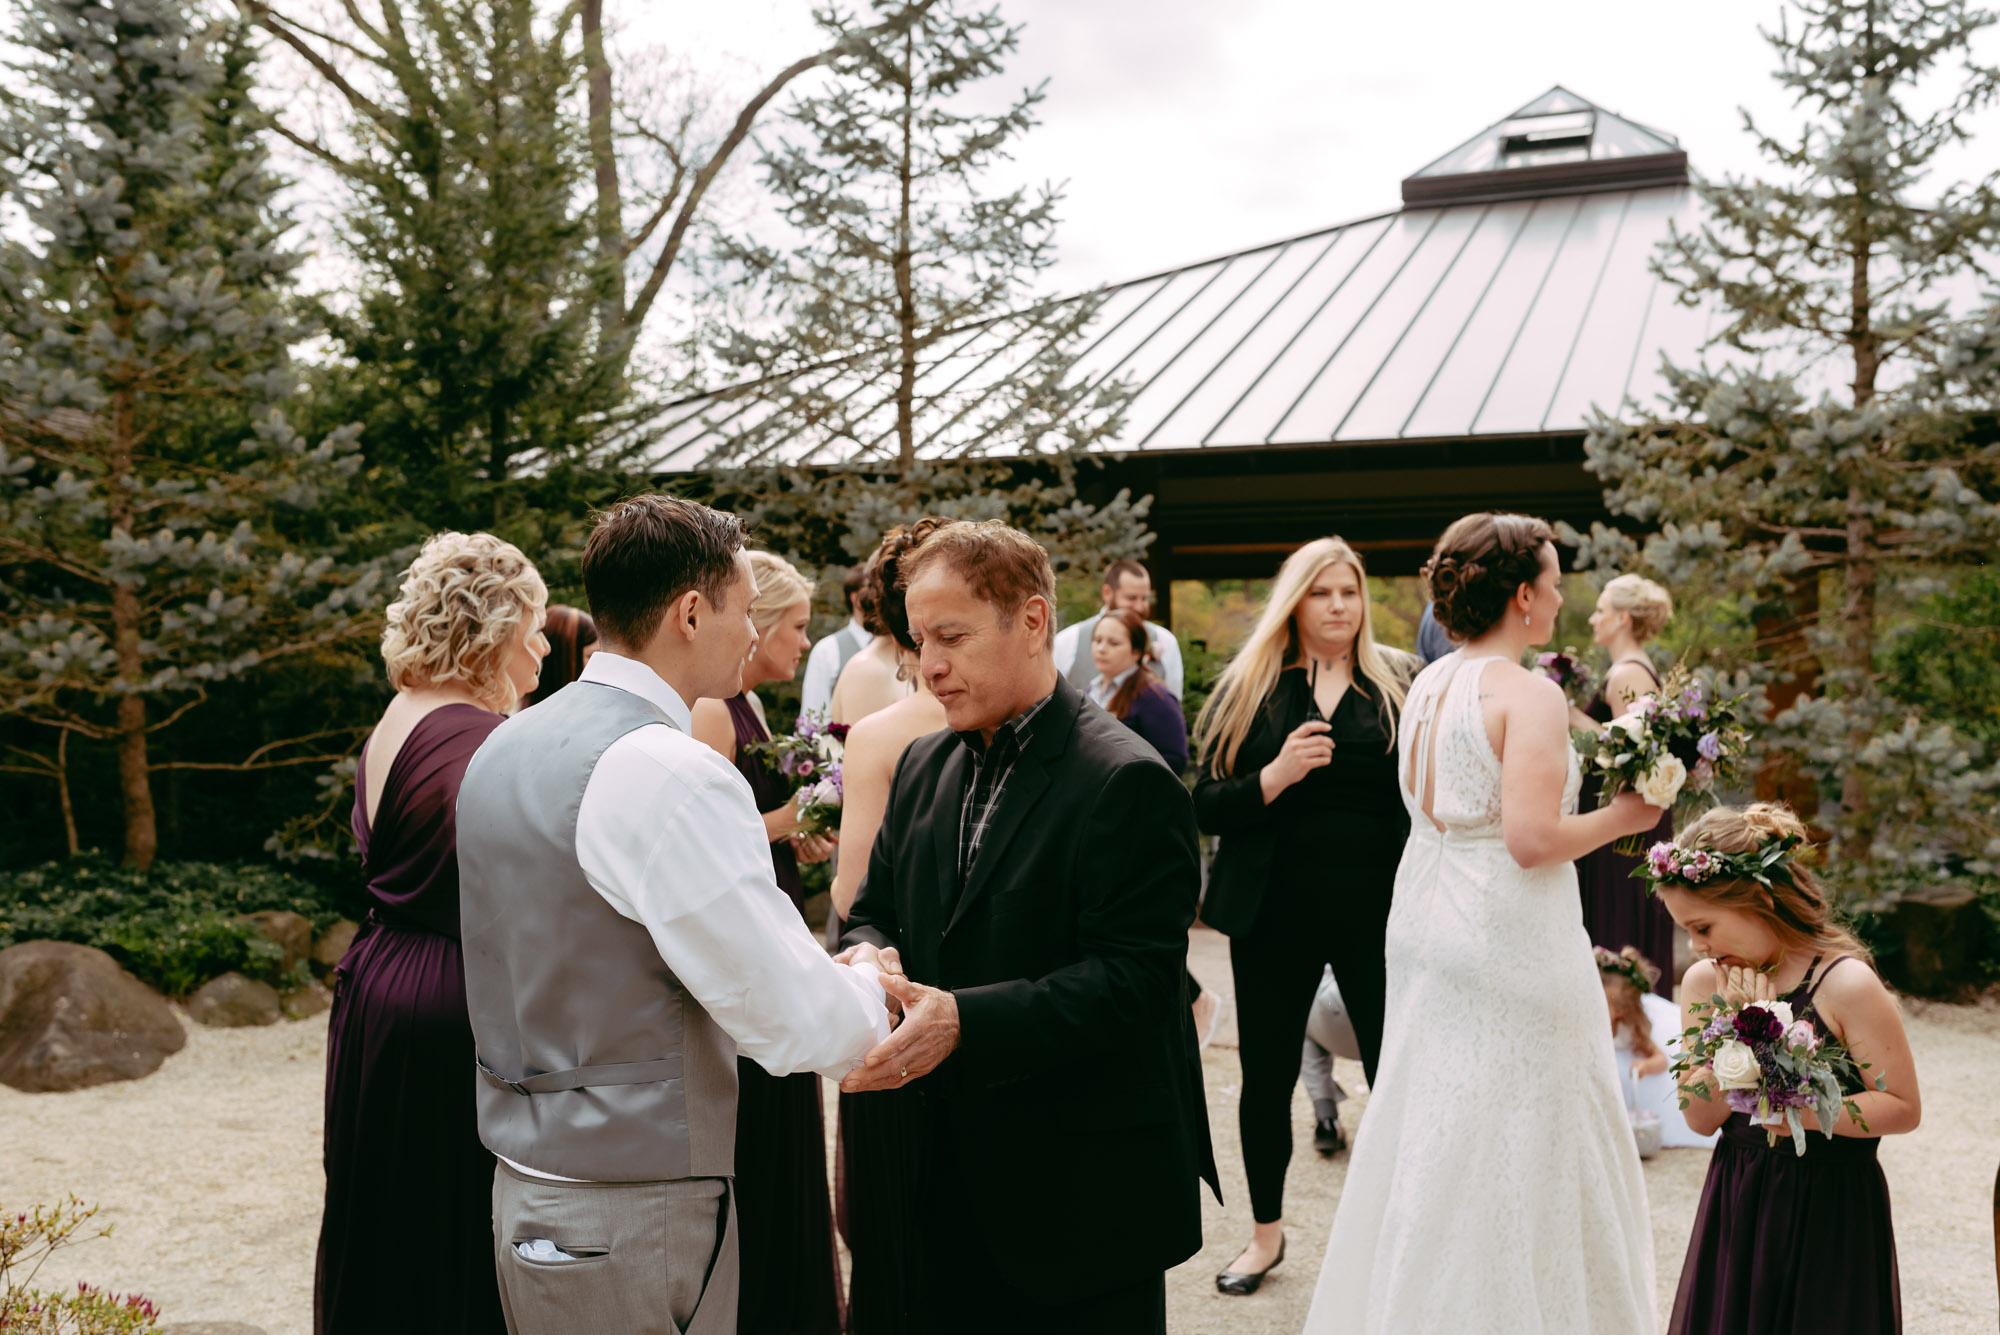 prairie-street-brewhouse-wedding-Rockford-IL-wedding-photographers-153.jpg